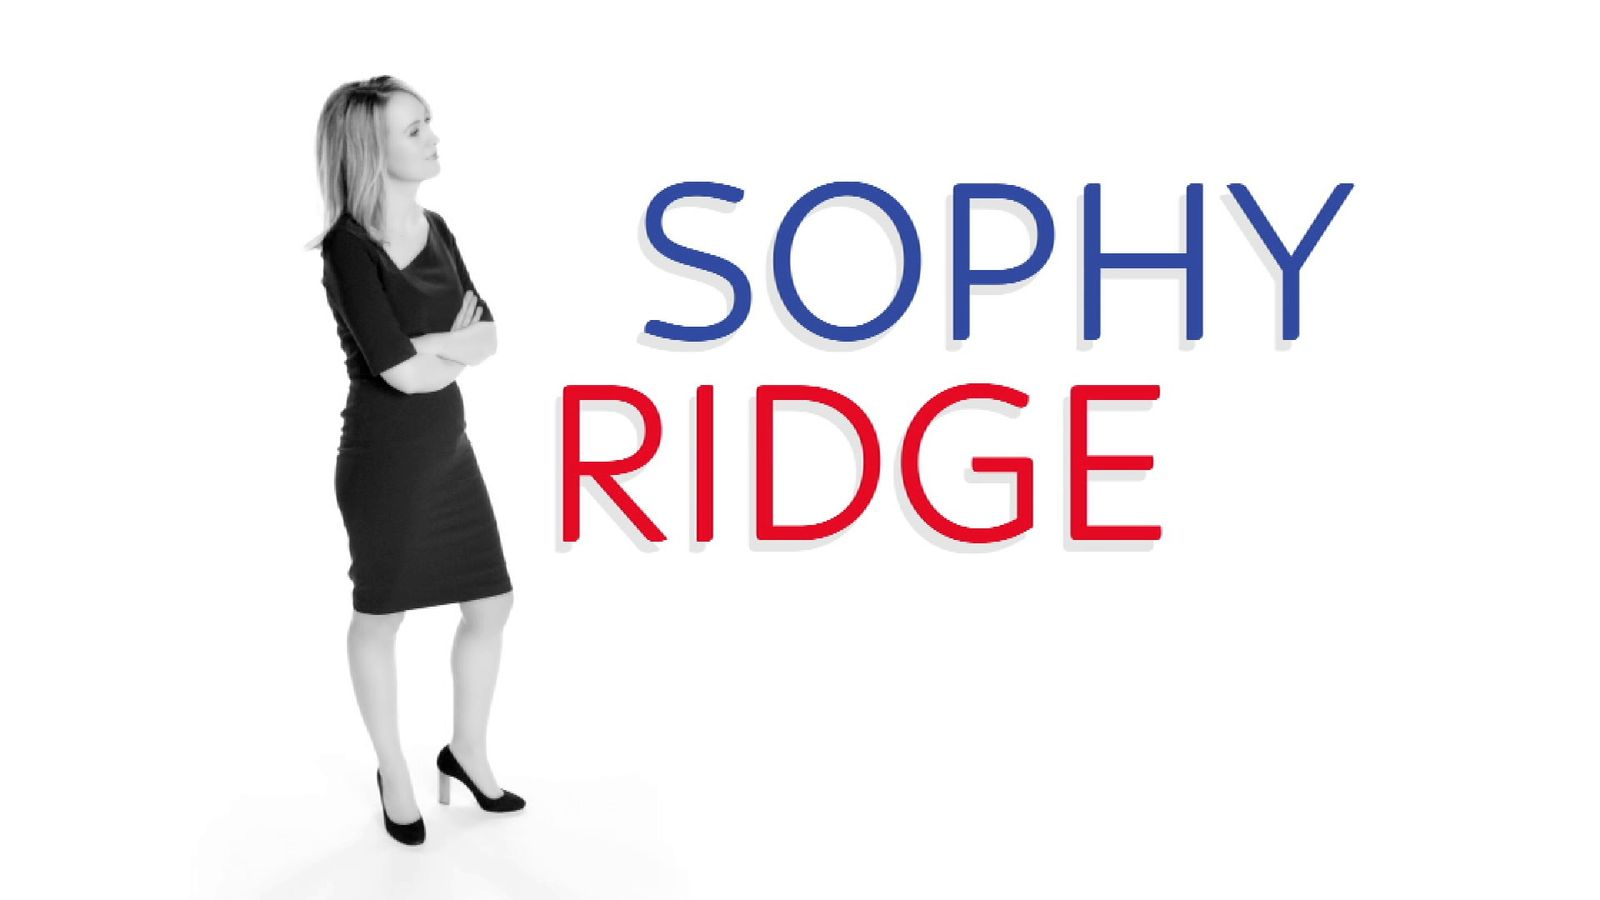 Sophy Ridge Talks To Chuka Umunna And Lord Lamont